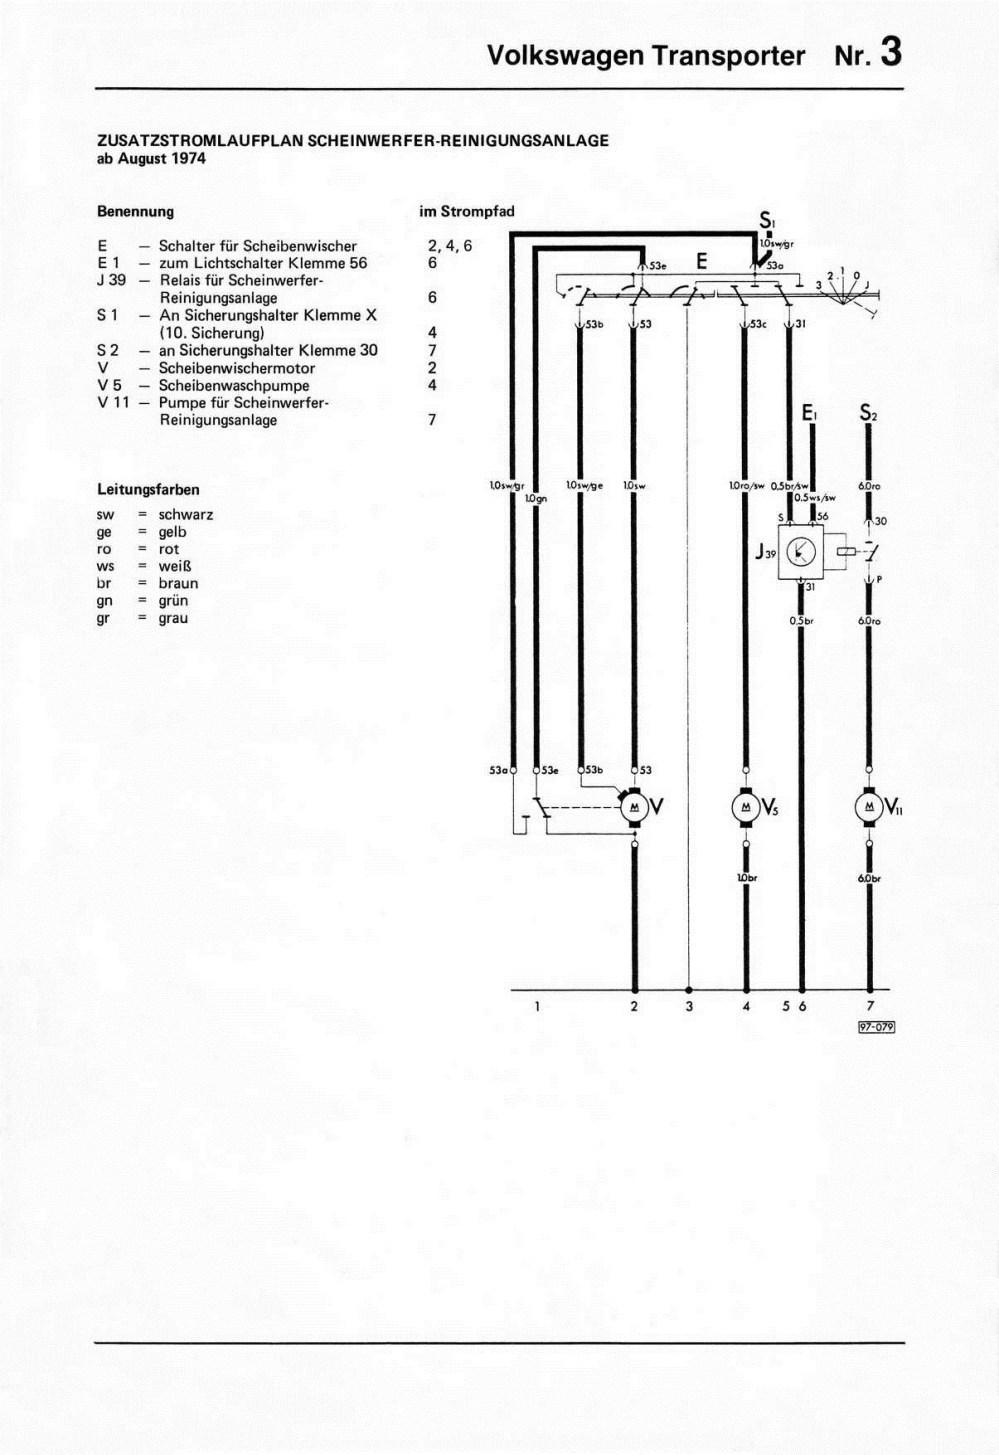 medium resolution of http www thesamba com vw archives info wiring baybus 1974up headlight washer jpg